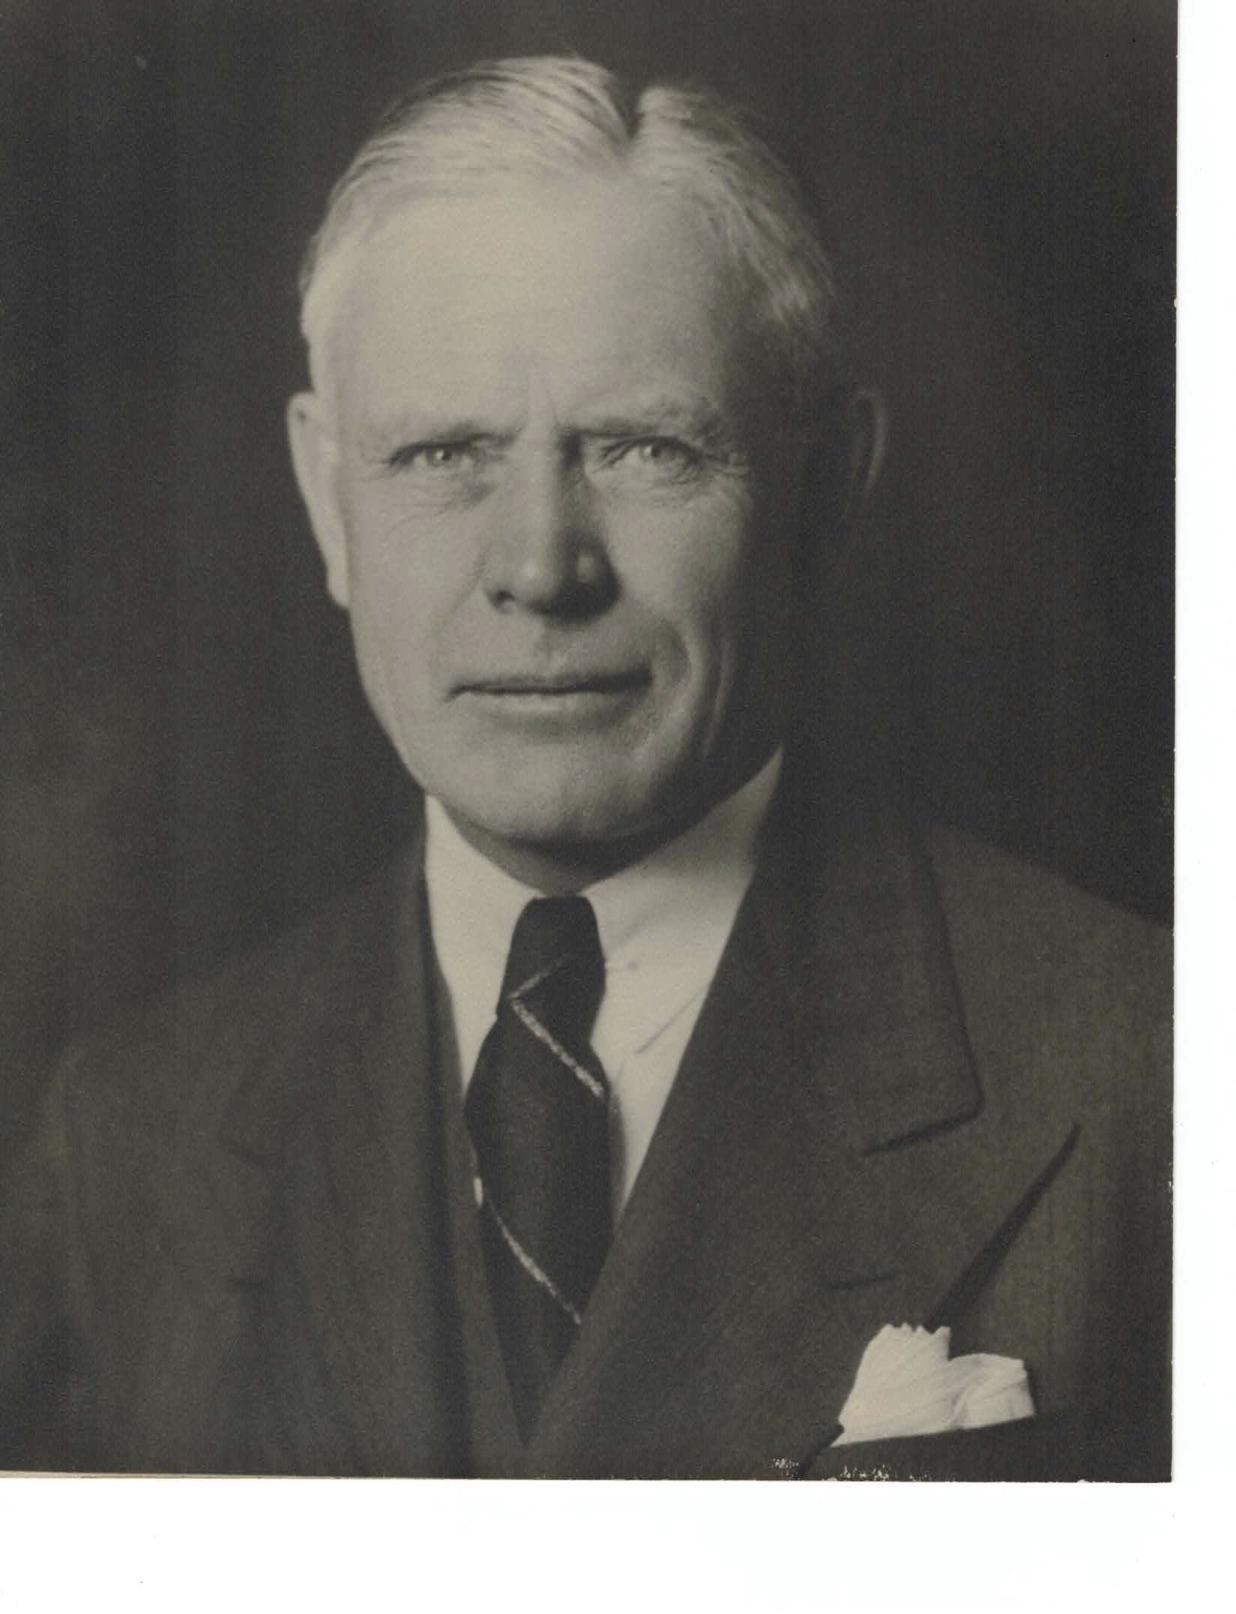 ROY E. CAMPBELL 1923-24